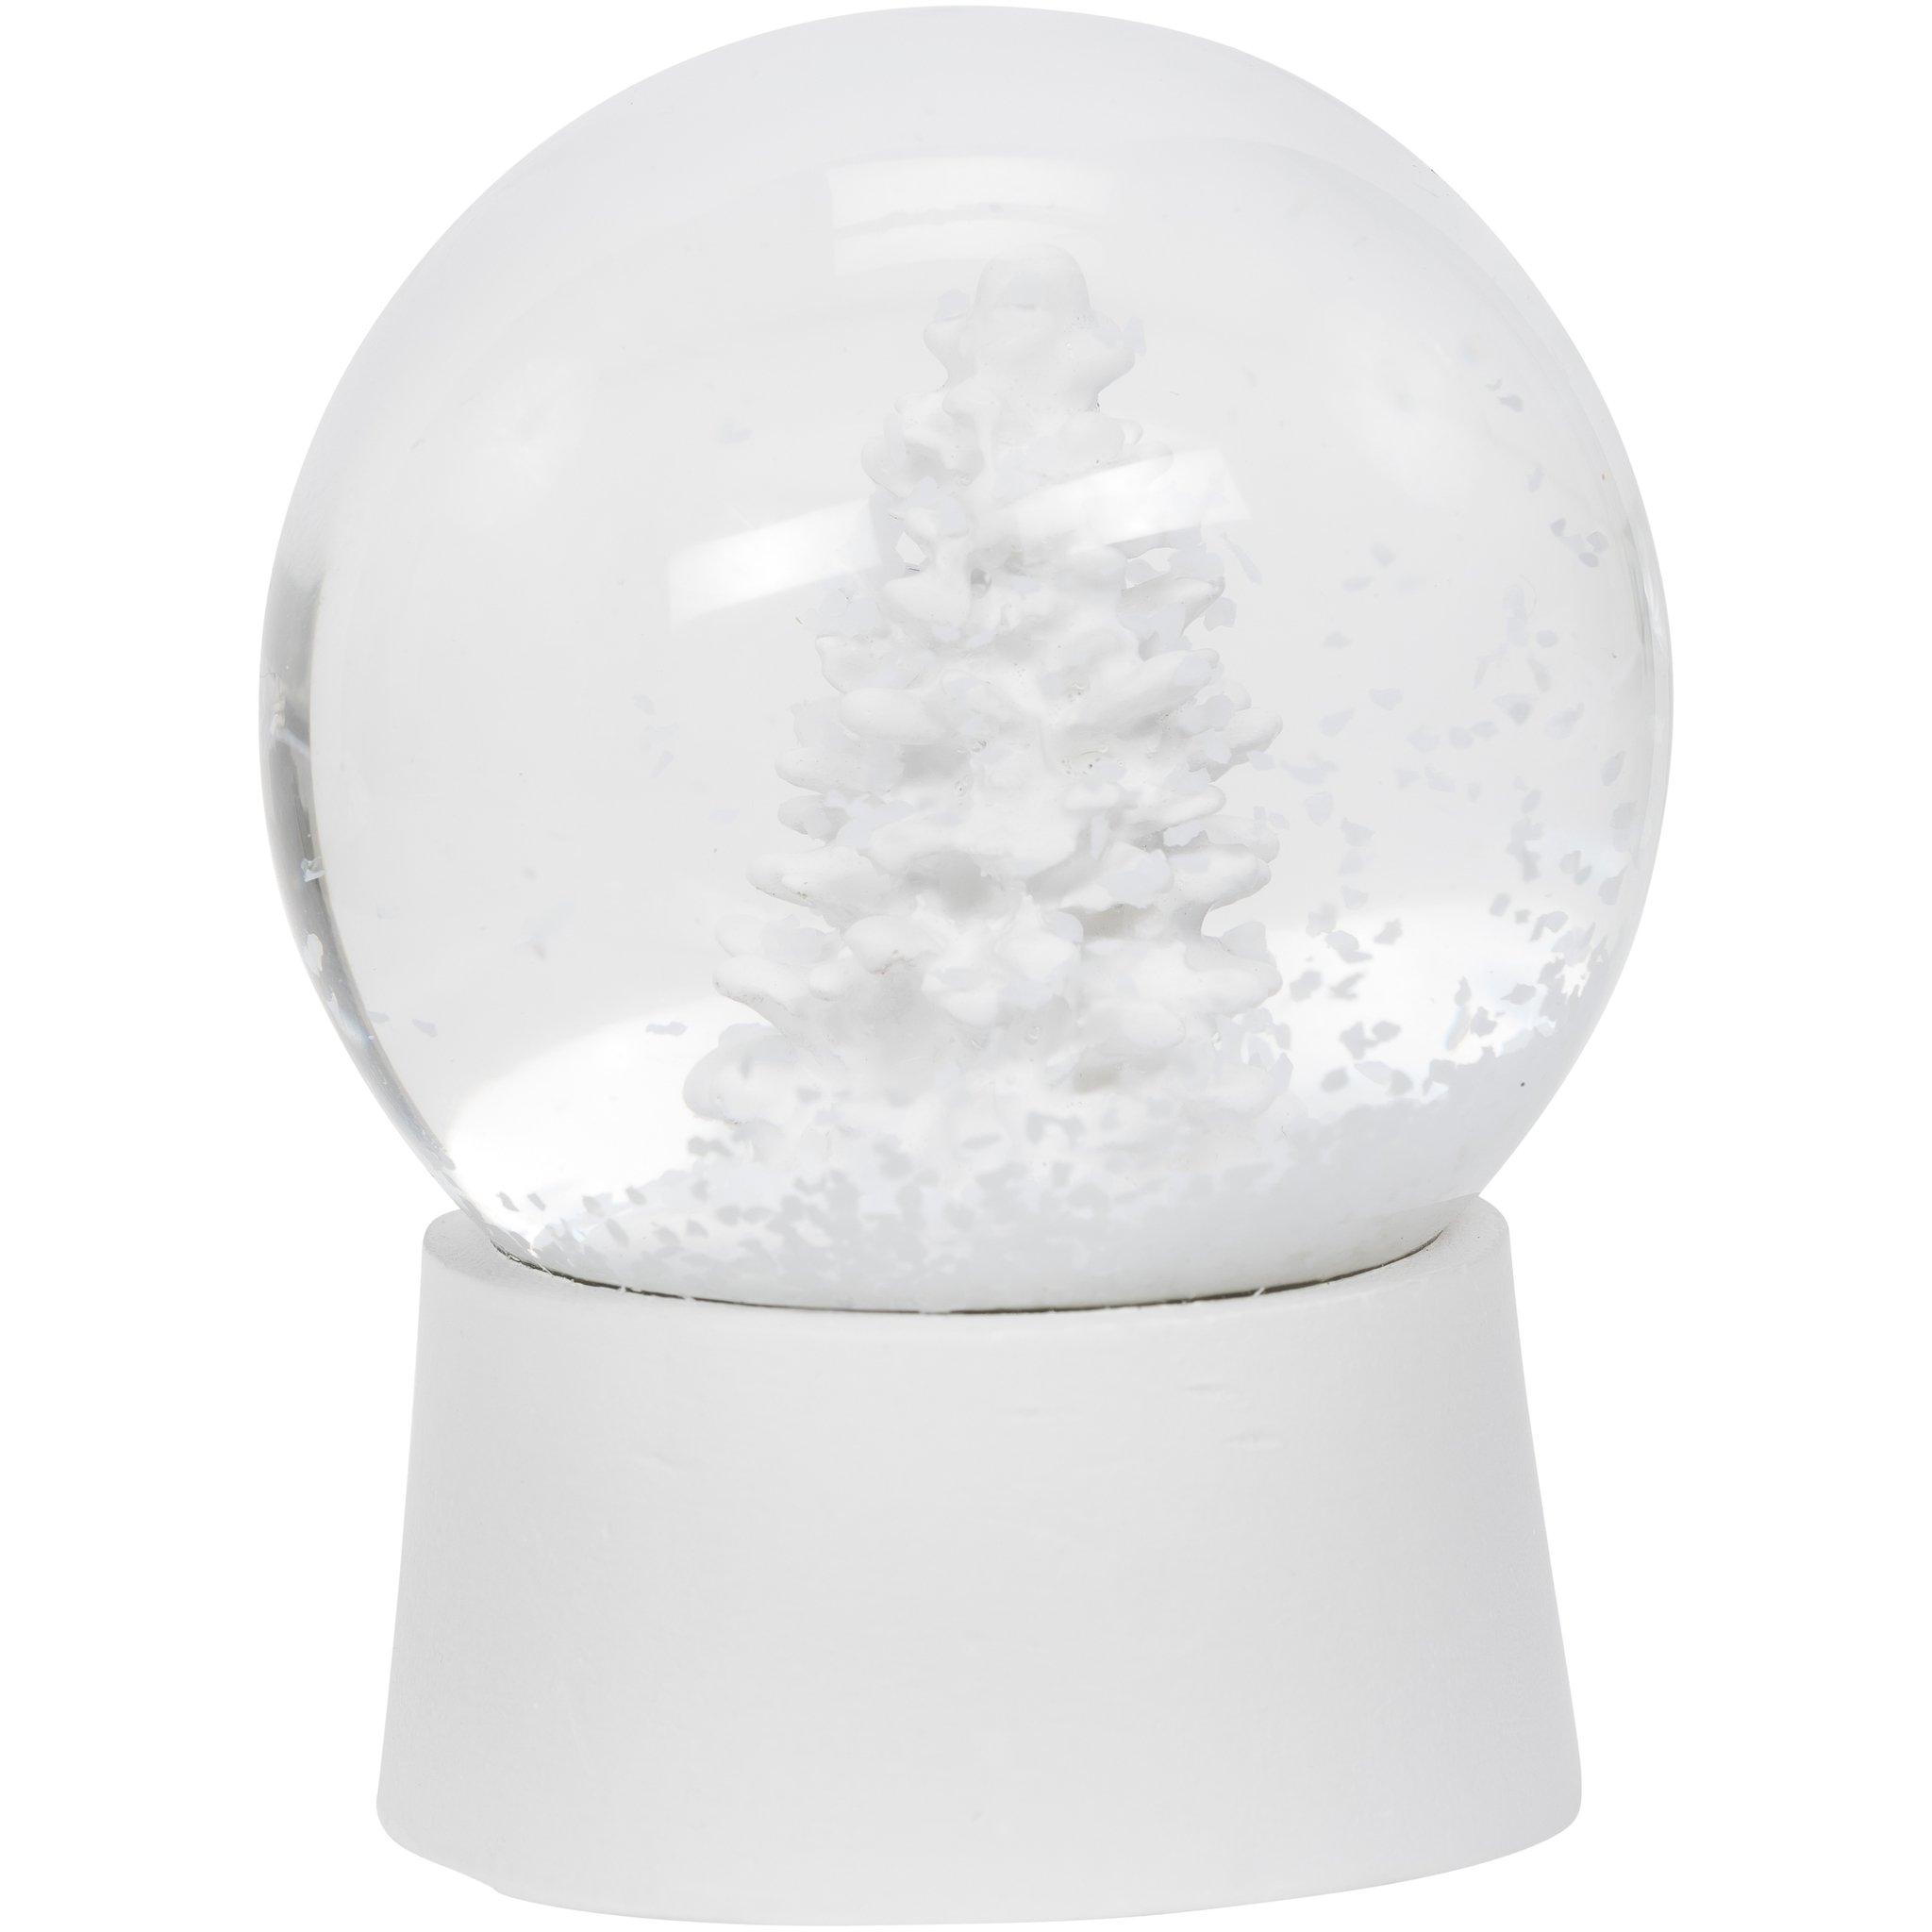 Bullet snow globe